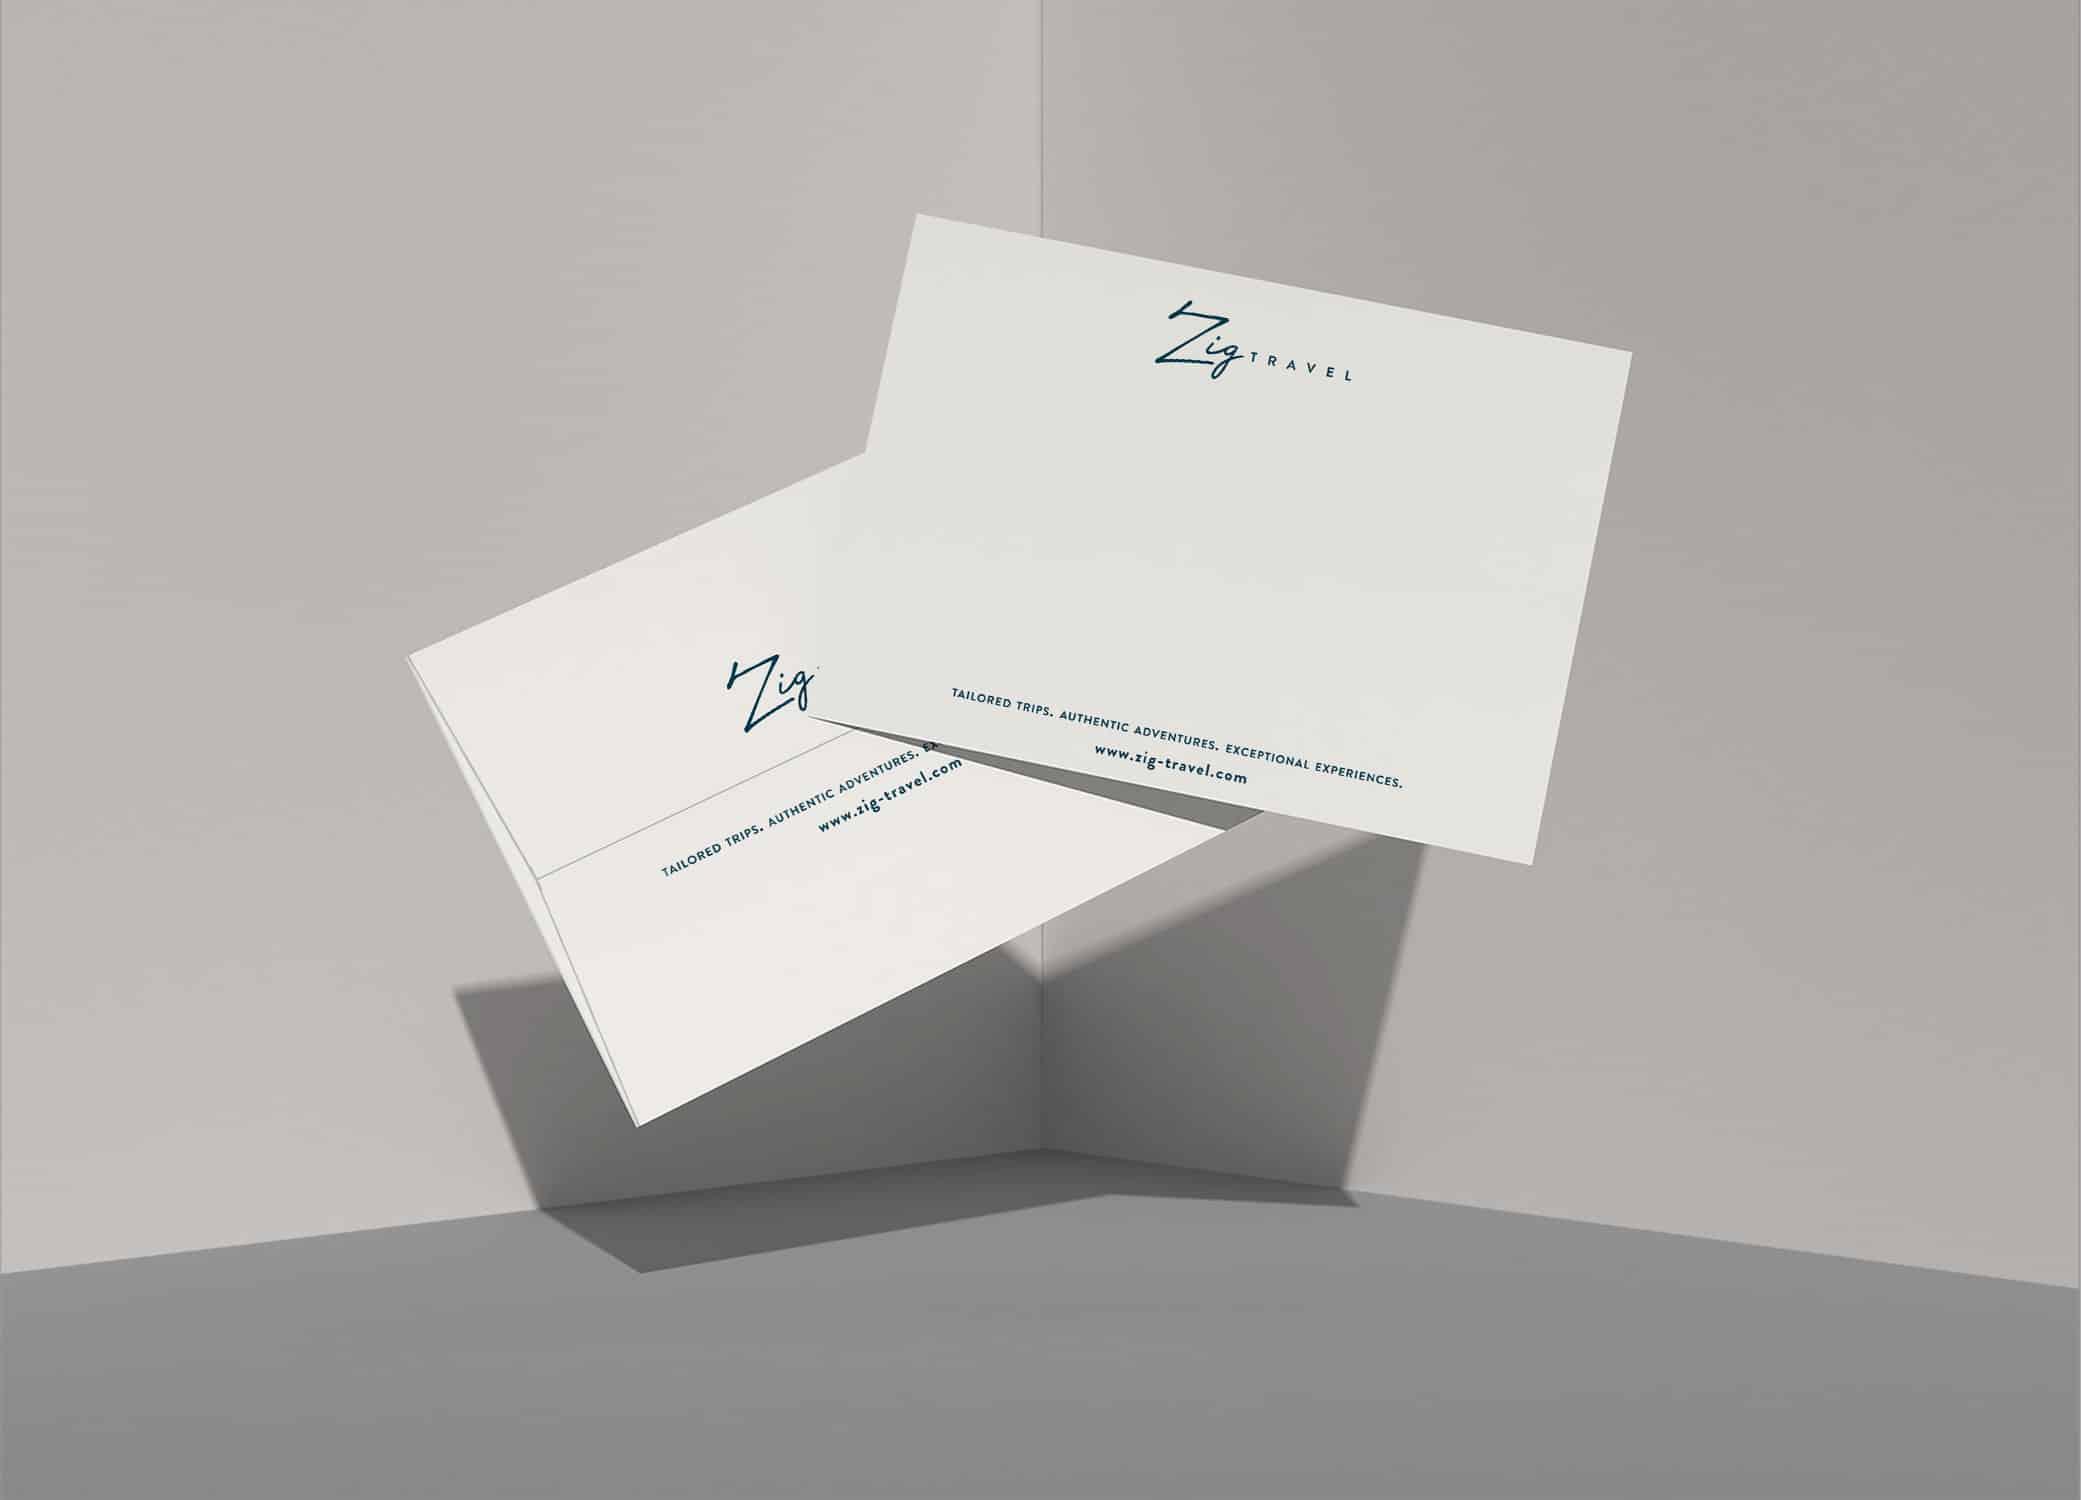 Zig Travel sleek branded note cards in clean white against grey background.